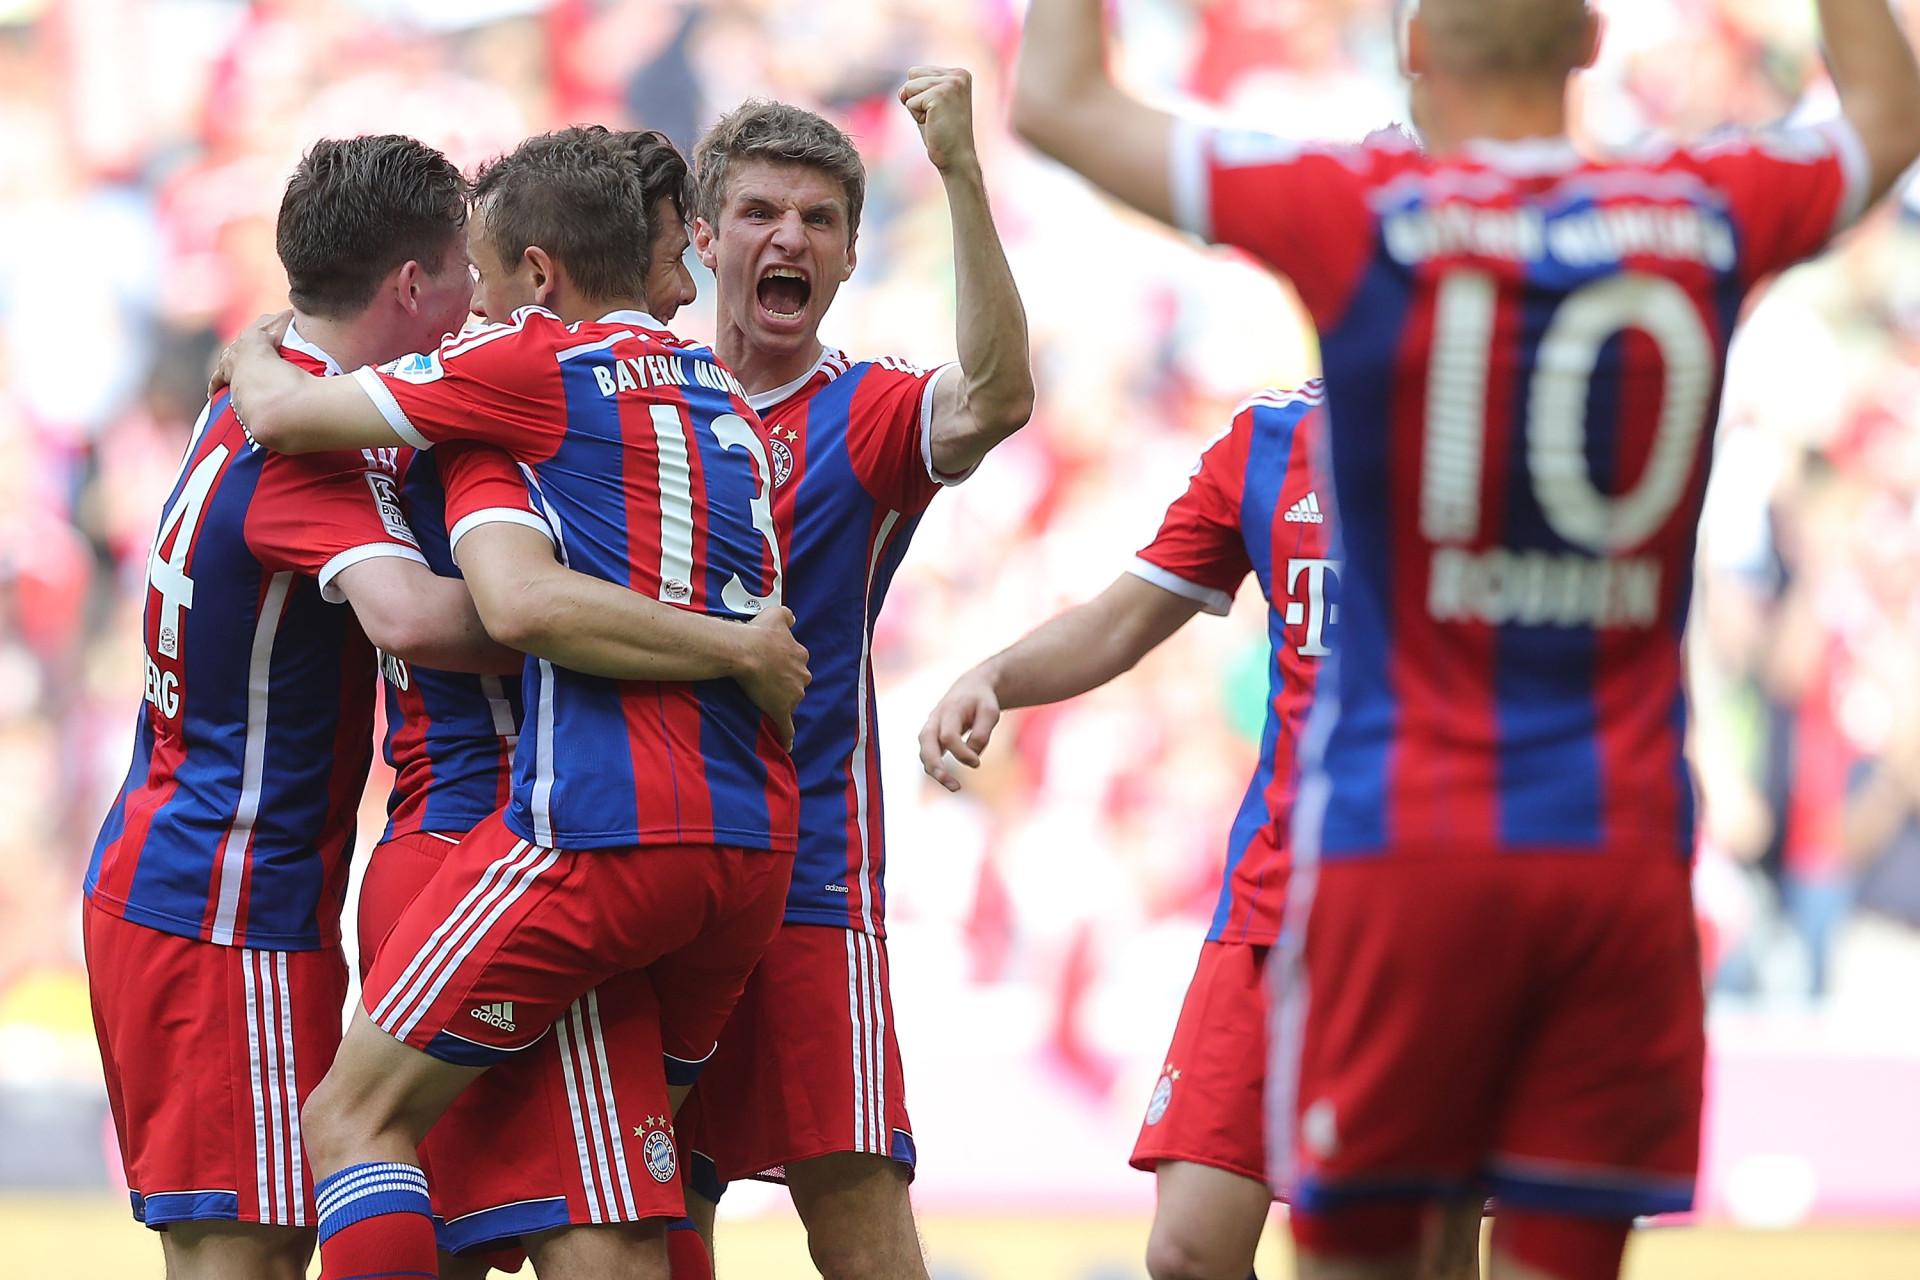 FC Bayern Muenchen v VfB Stuttgart - Bundesliga For DFL